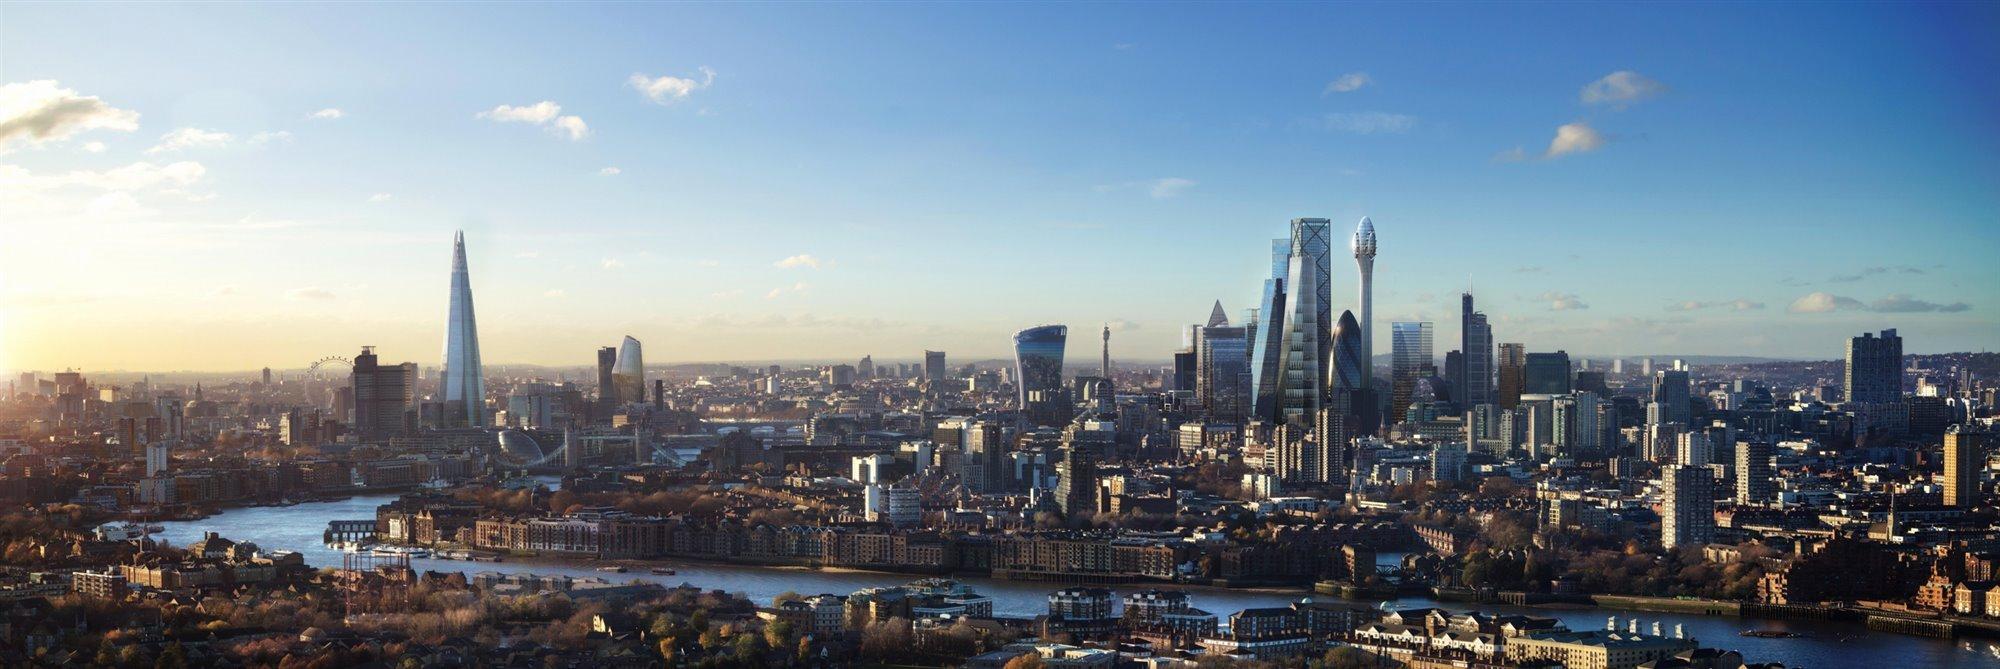 Skyline de Londres en 2025